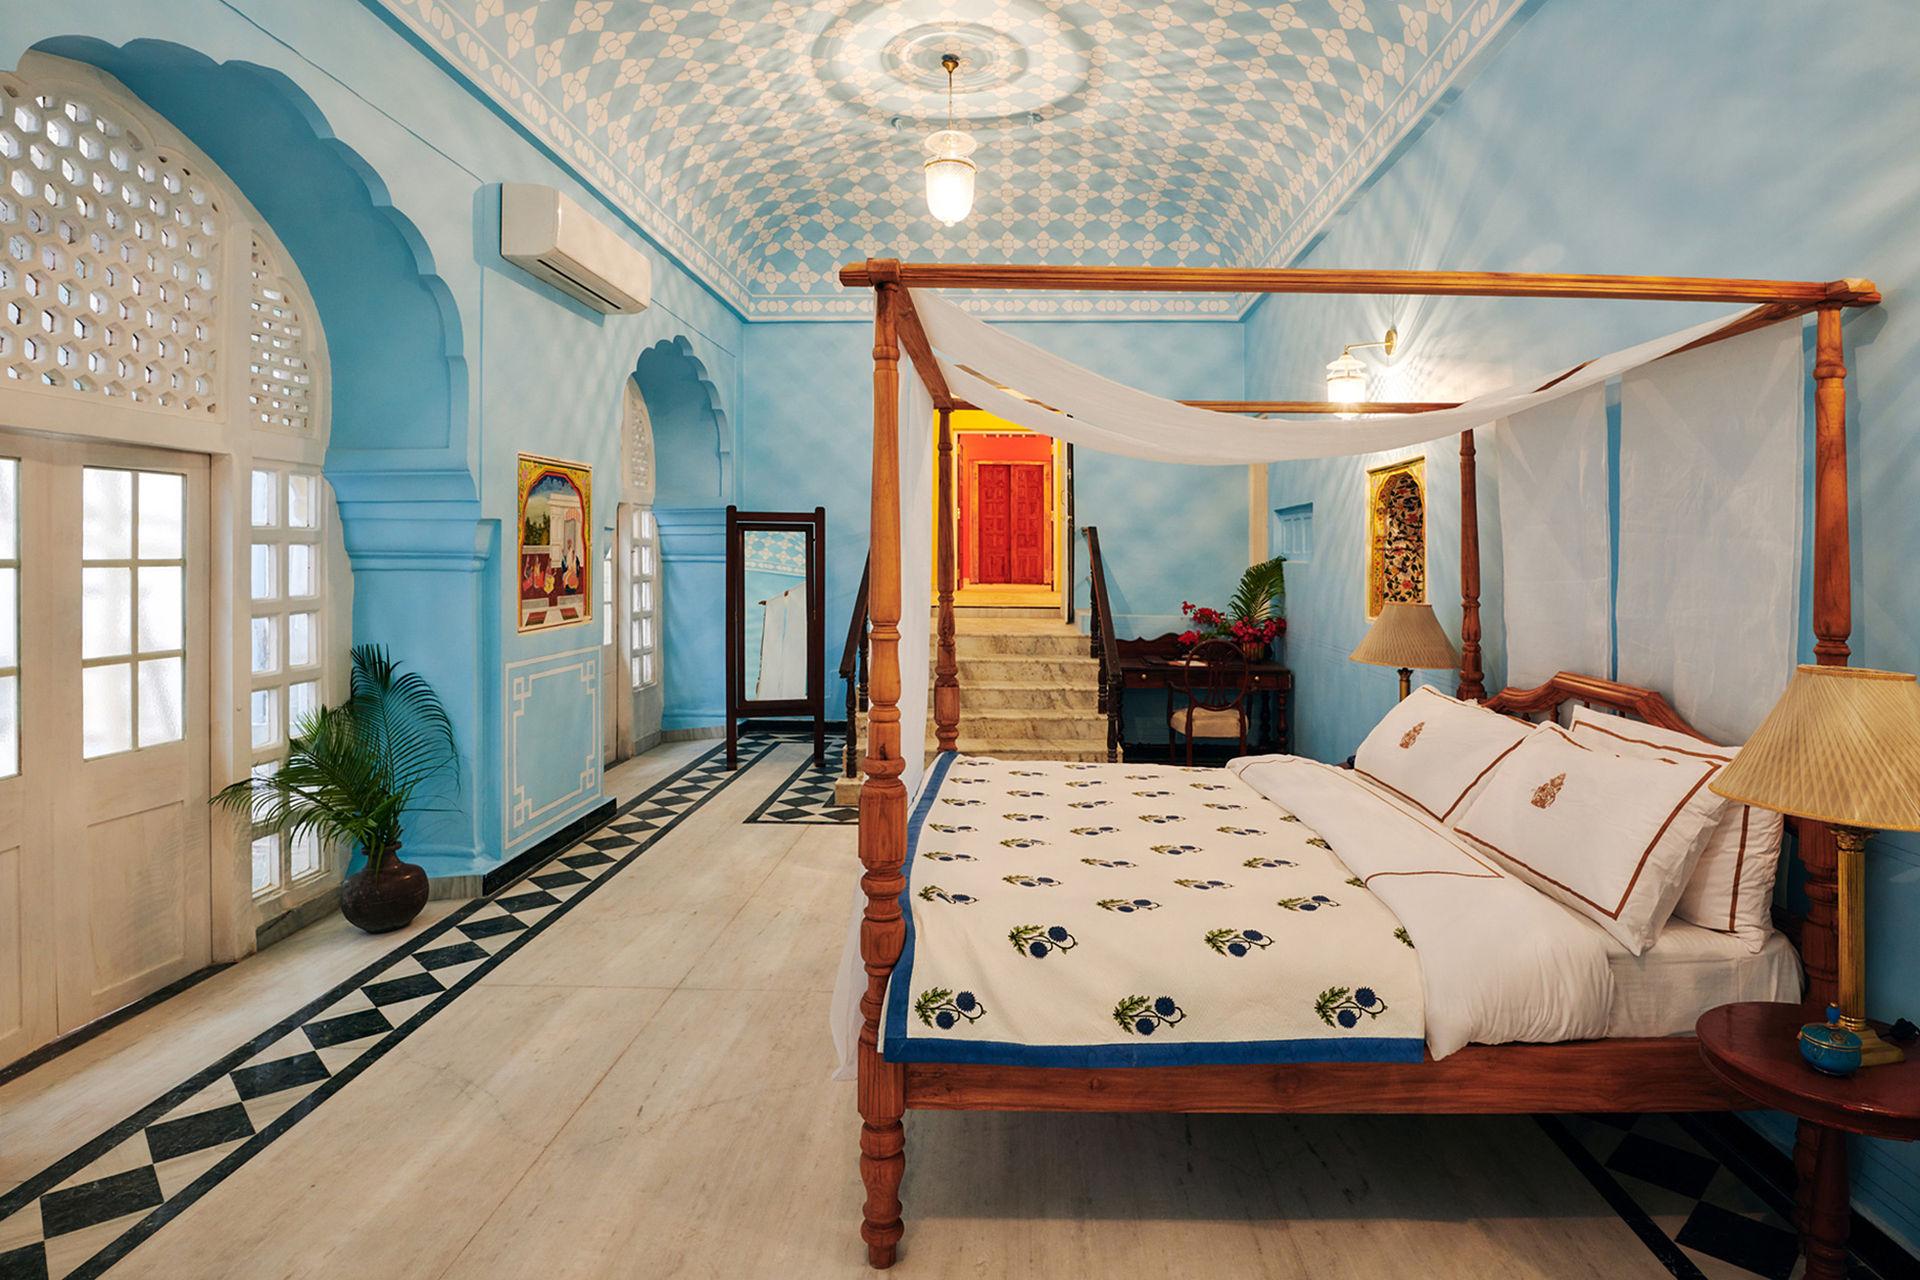 Nu kan du bo i stadspalatset i Jaipur